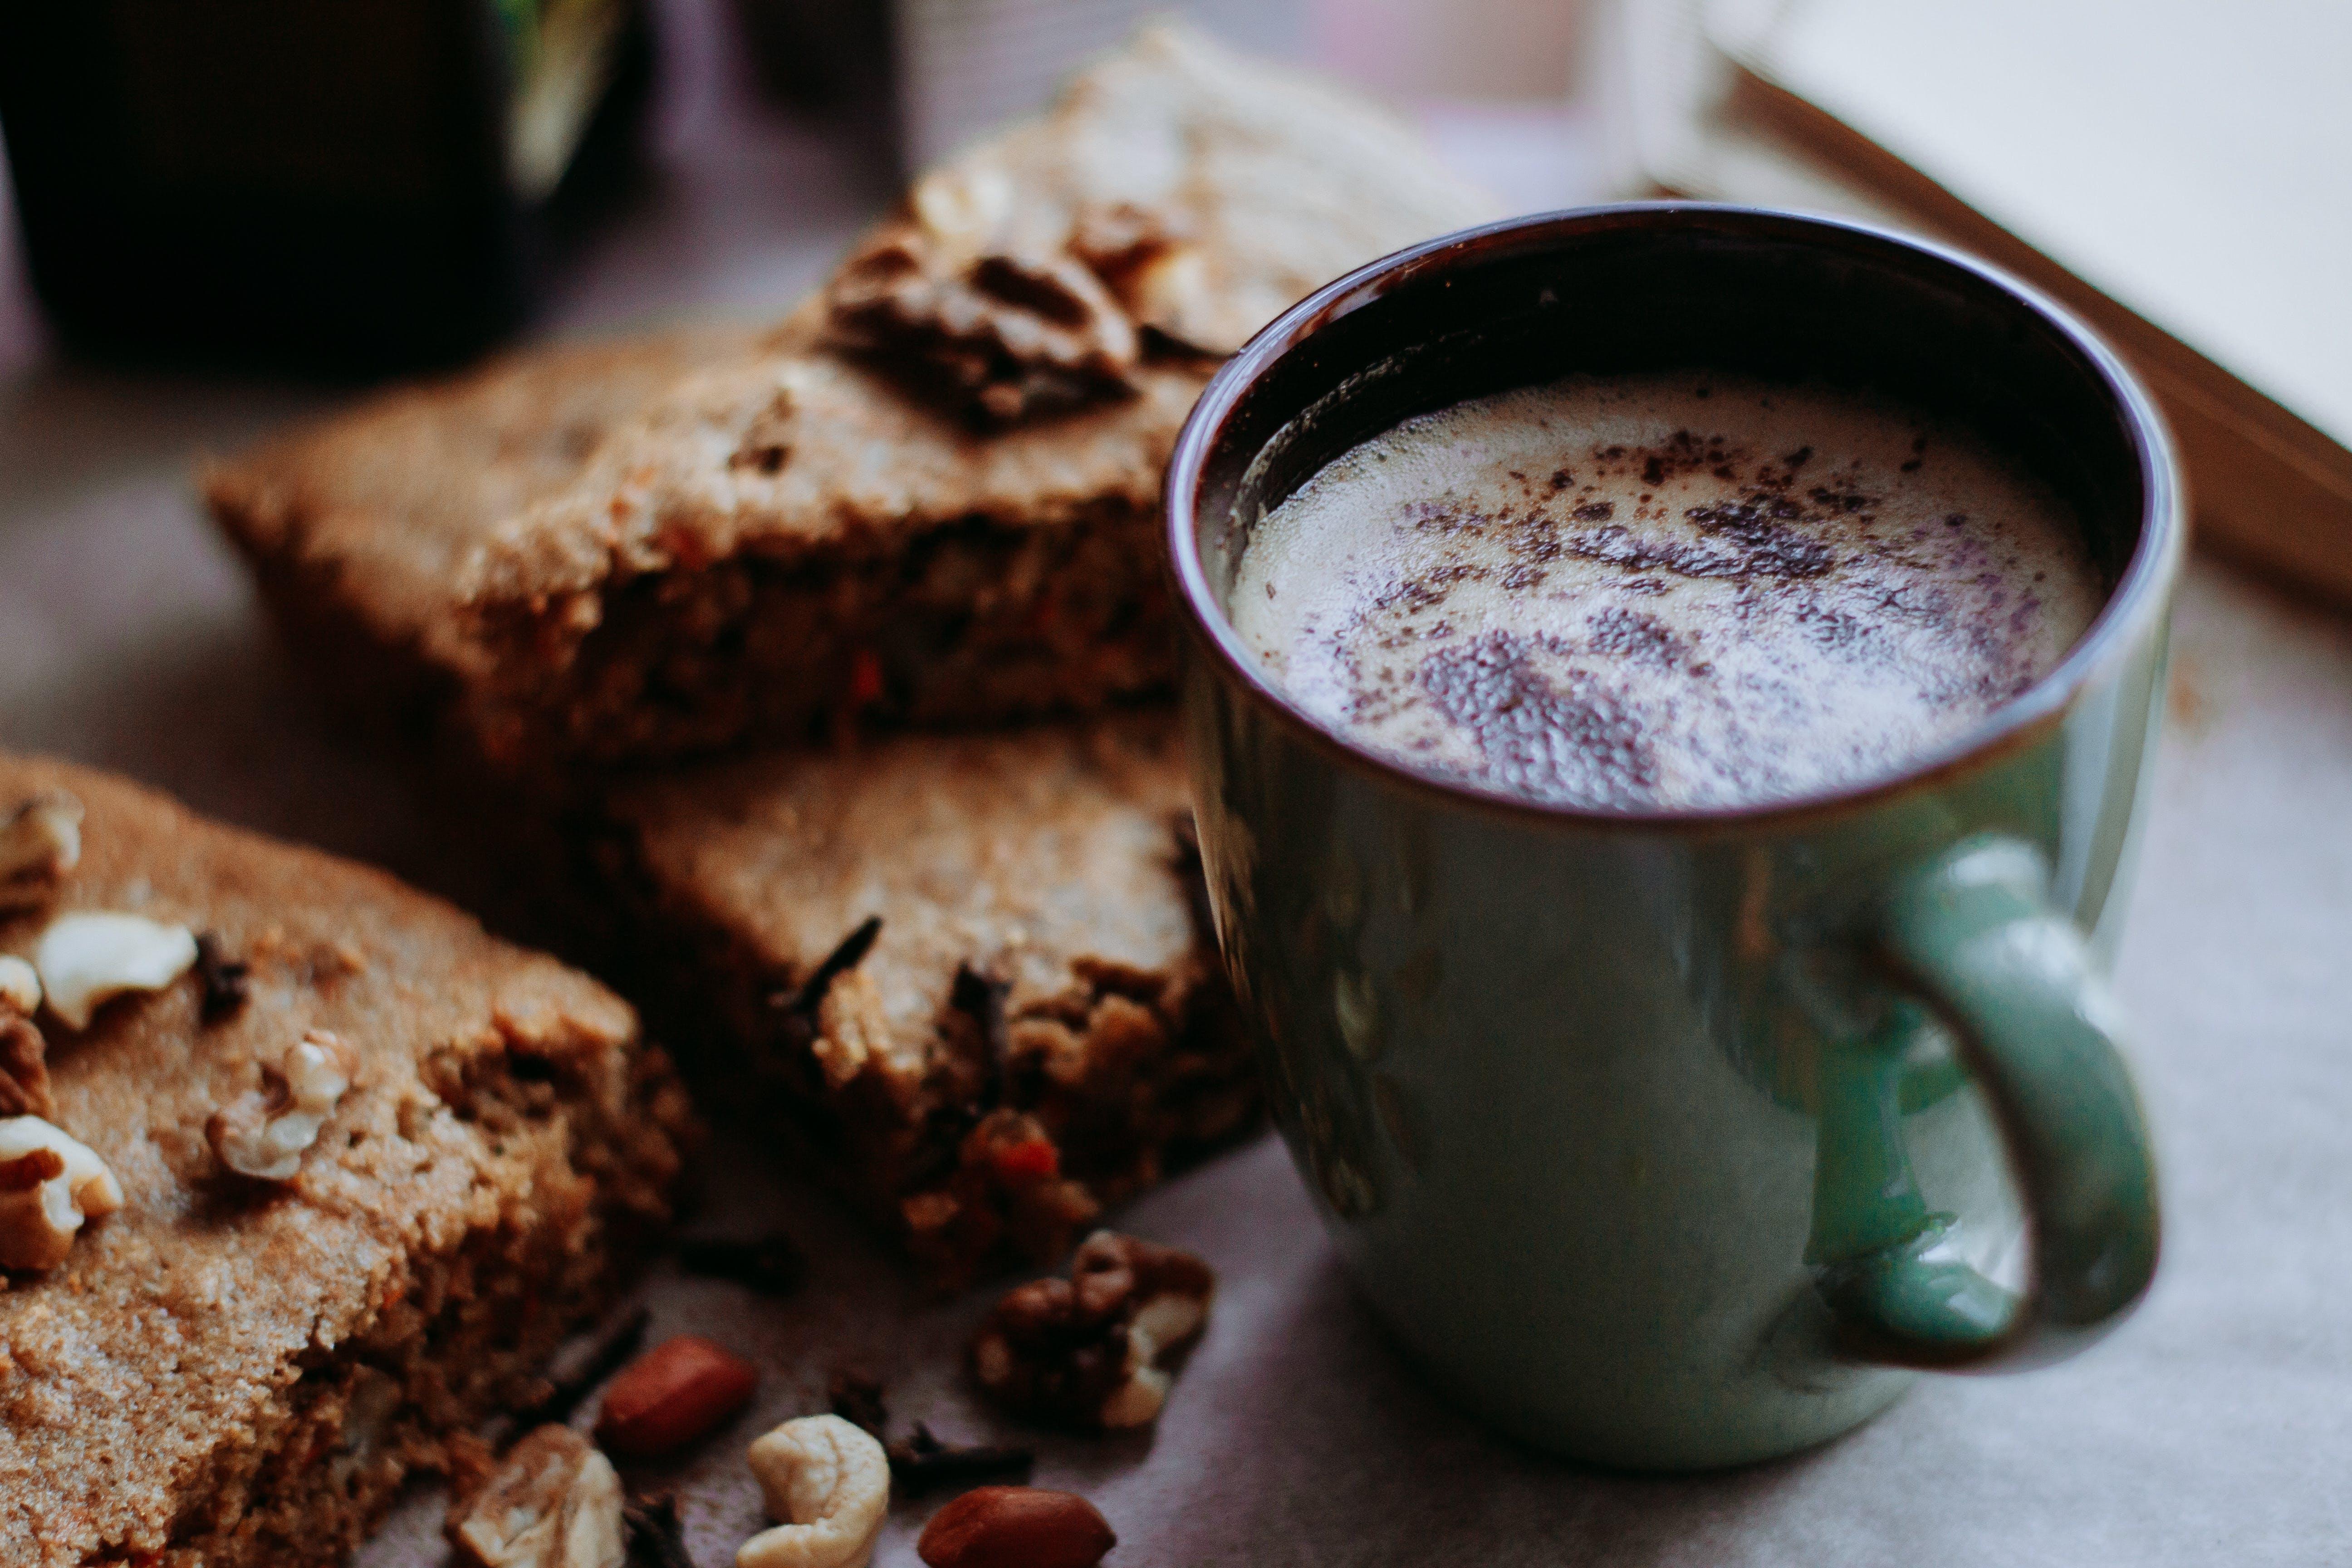 Kostenloses Stock Foto zu becher, brot, cappuccino, dessert